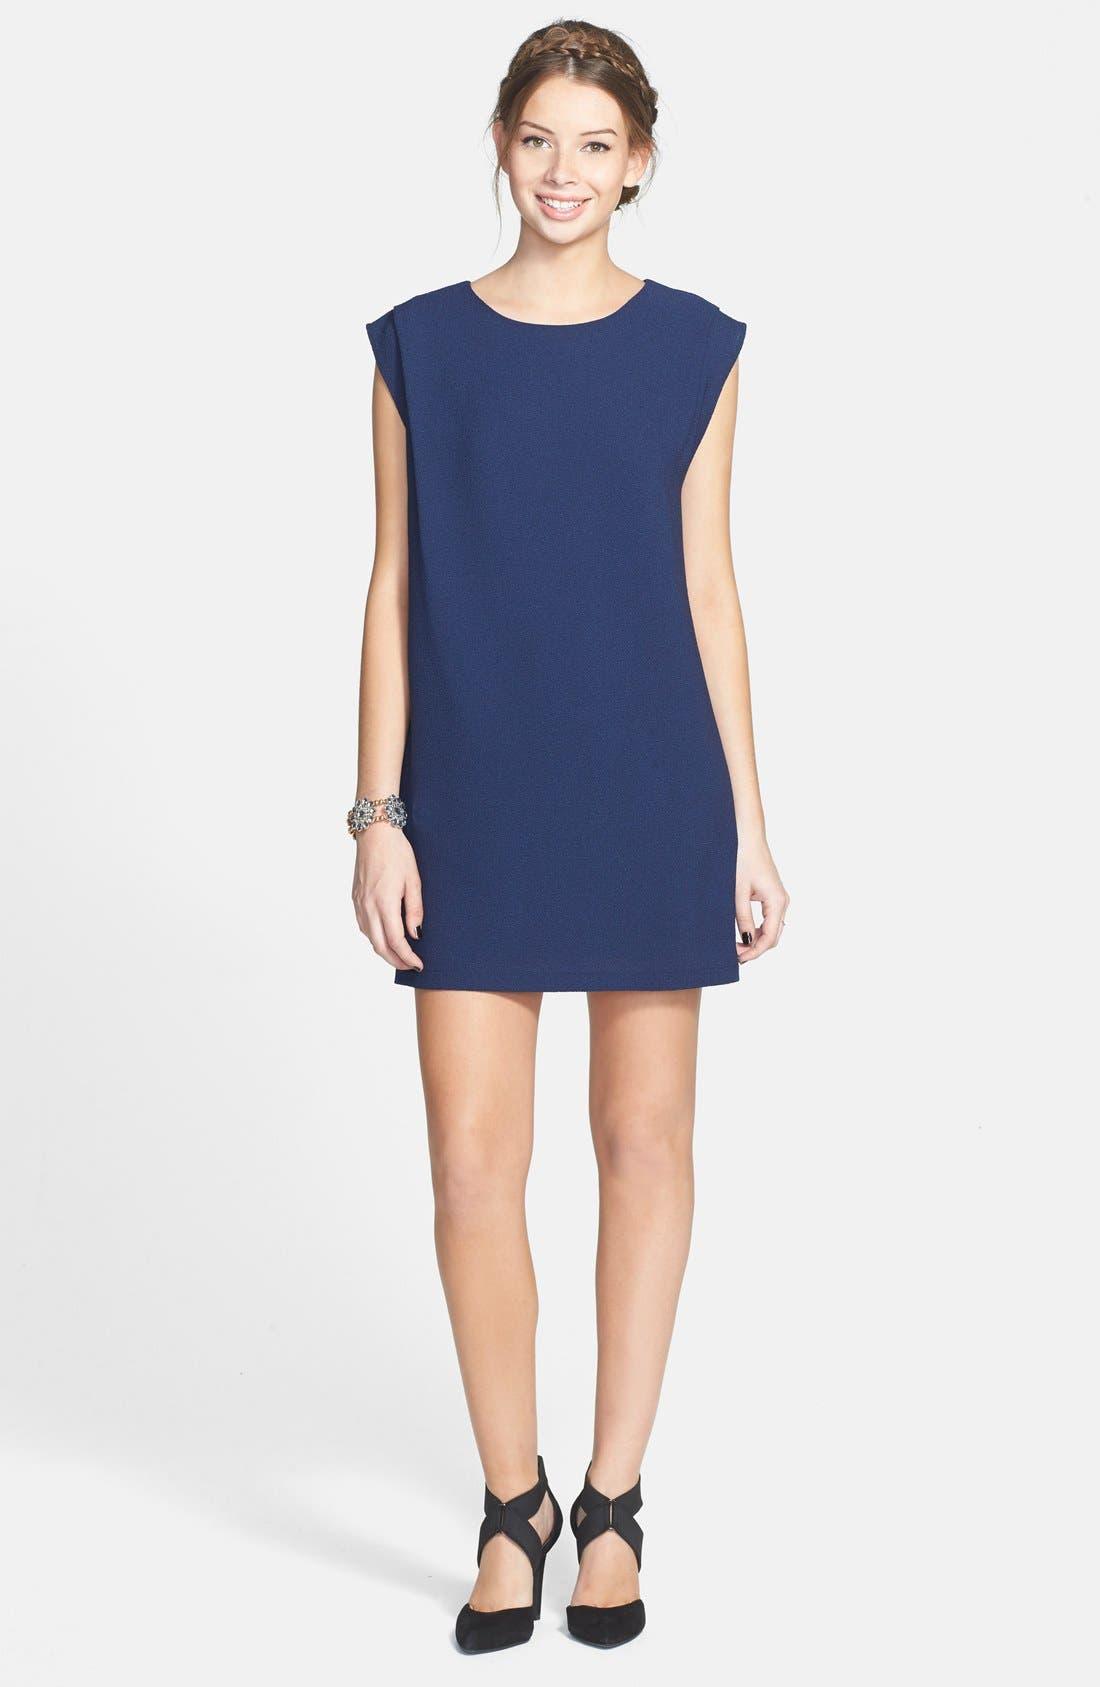 Alternate Image 1 Selected - Everly Shift Dress (Juniors)